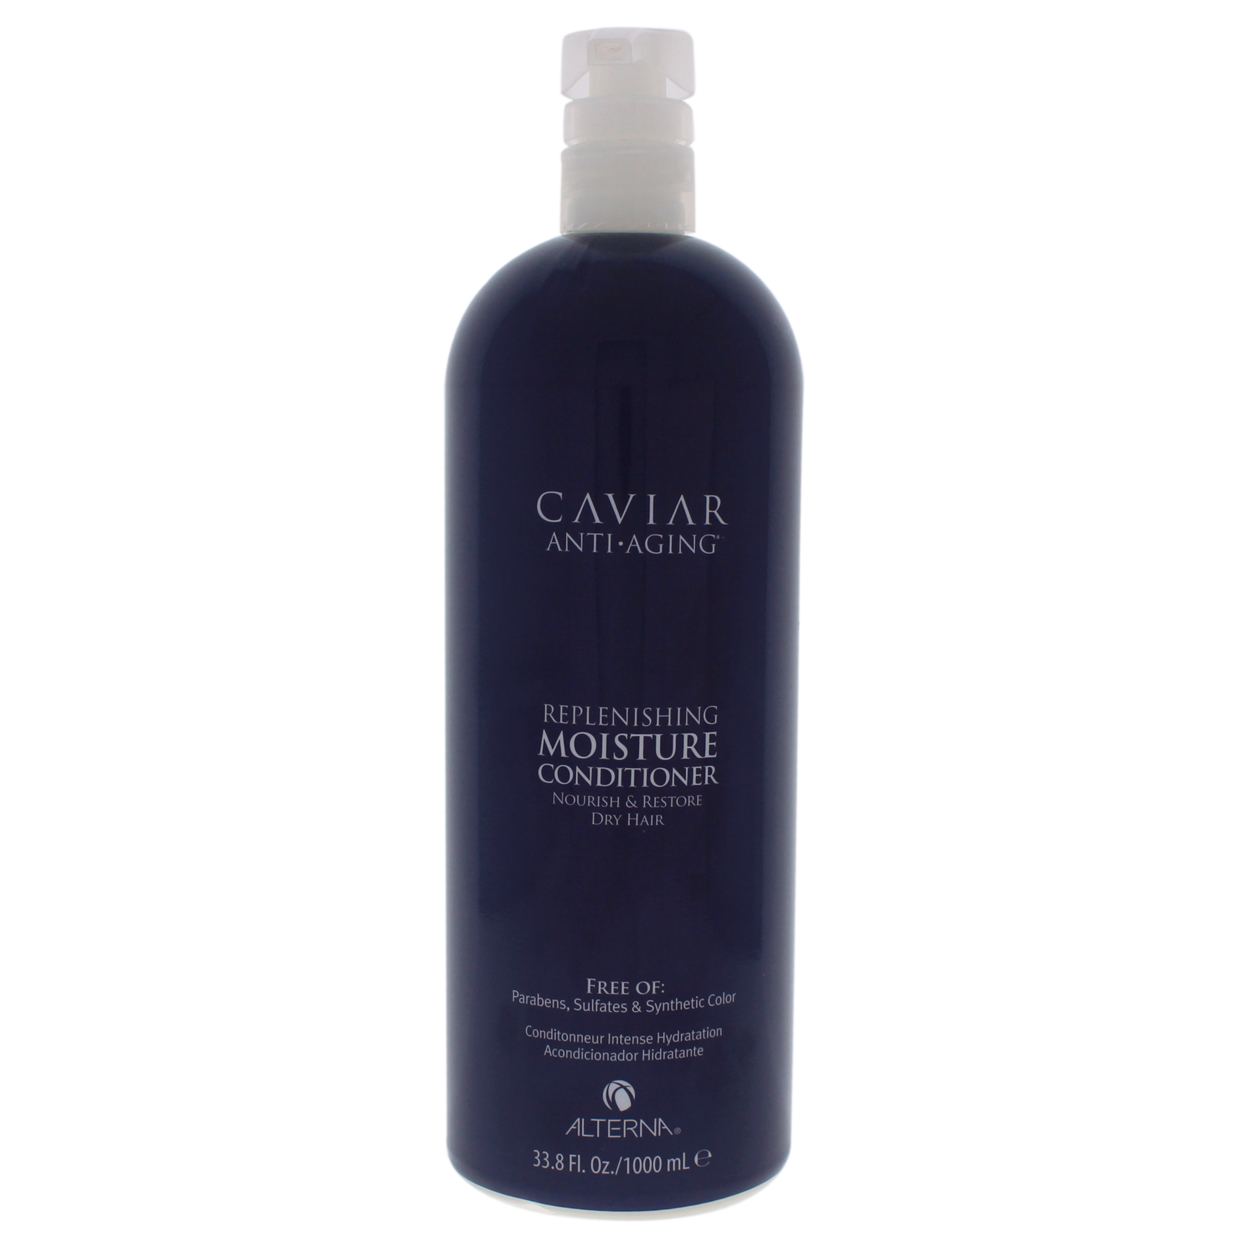 Caviar Anti Aging Replenishing Moisture Conditioner by Alterna for Unisex - 33.8 oz Conditioner alterna caviar anti aging молочко интенсивно увлажняющее caviar anti aging молочко интенсивно увлажняющее